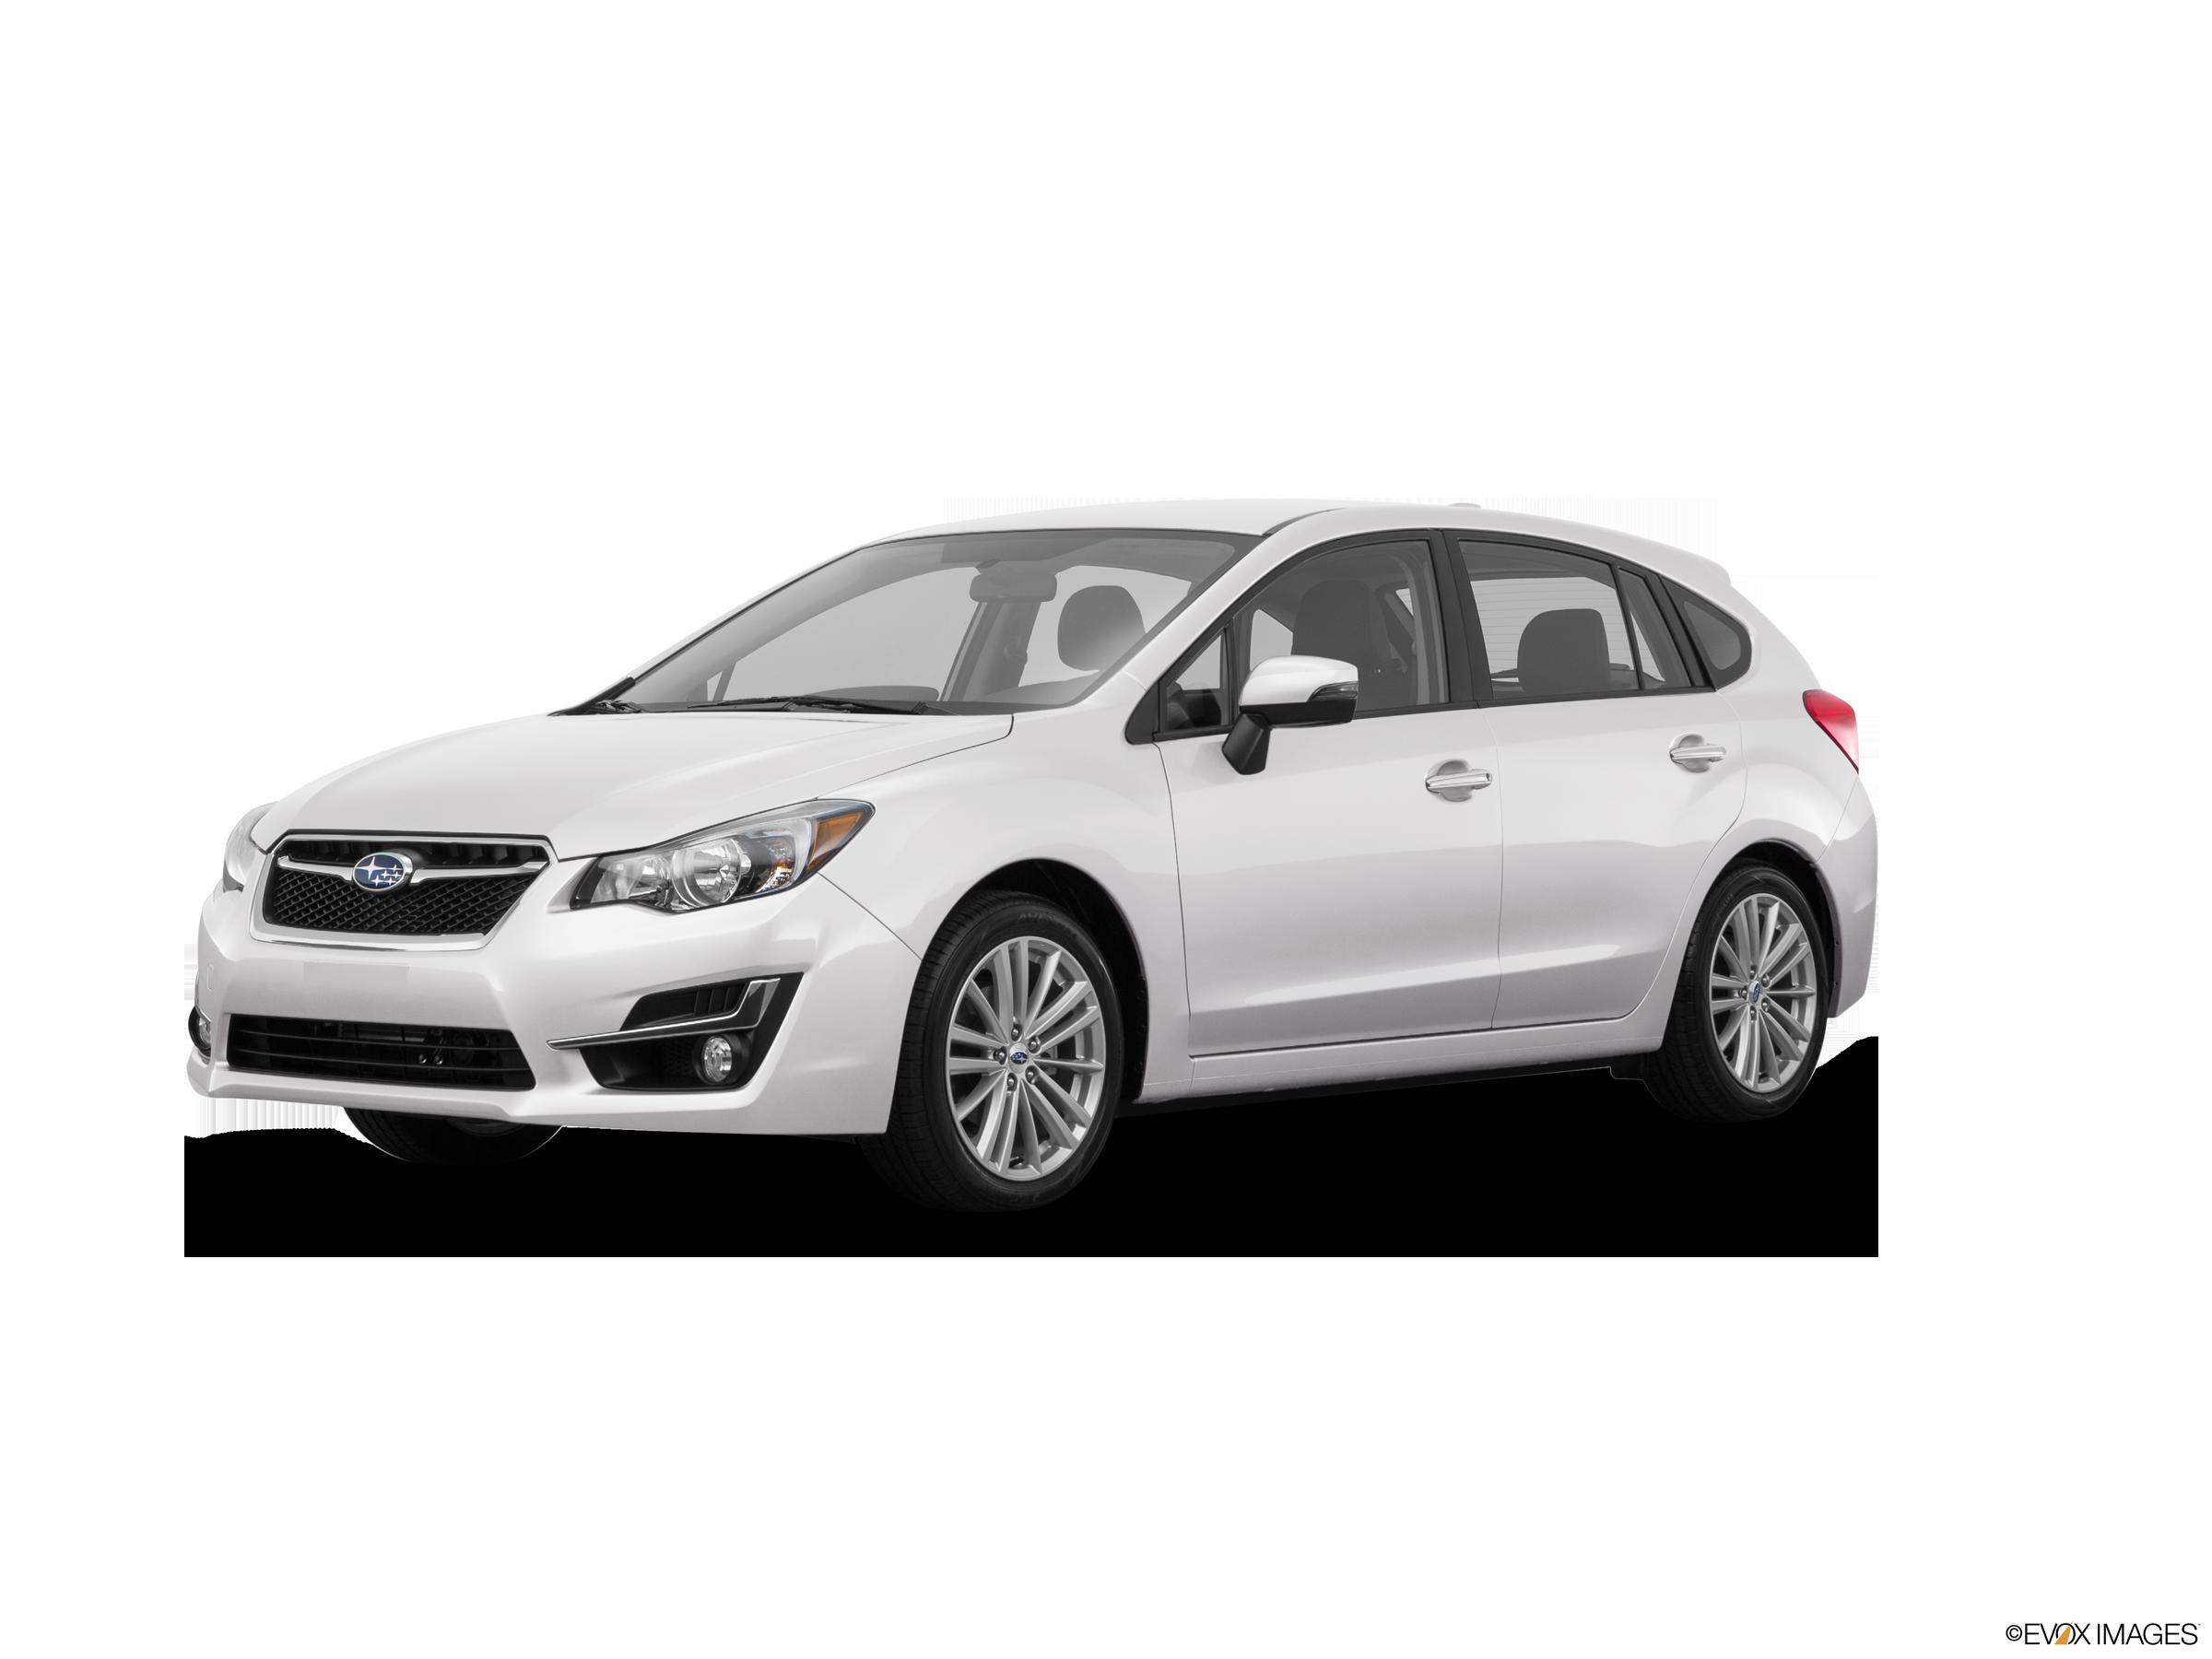 2016 subaru impreza values cars for sale kelley blue book 2016 subaru impreza values cars for